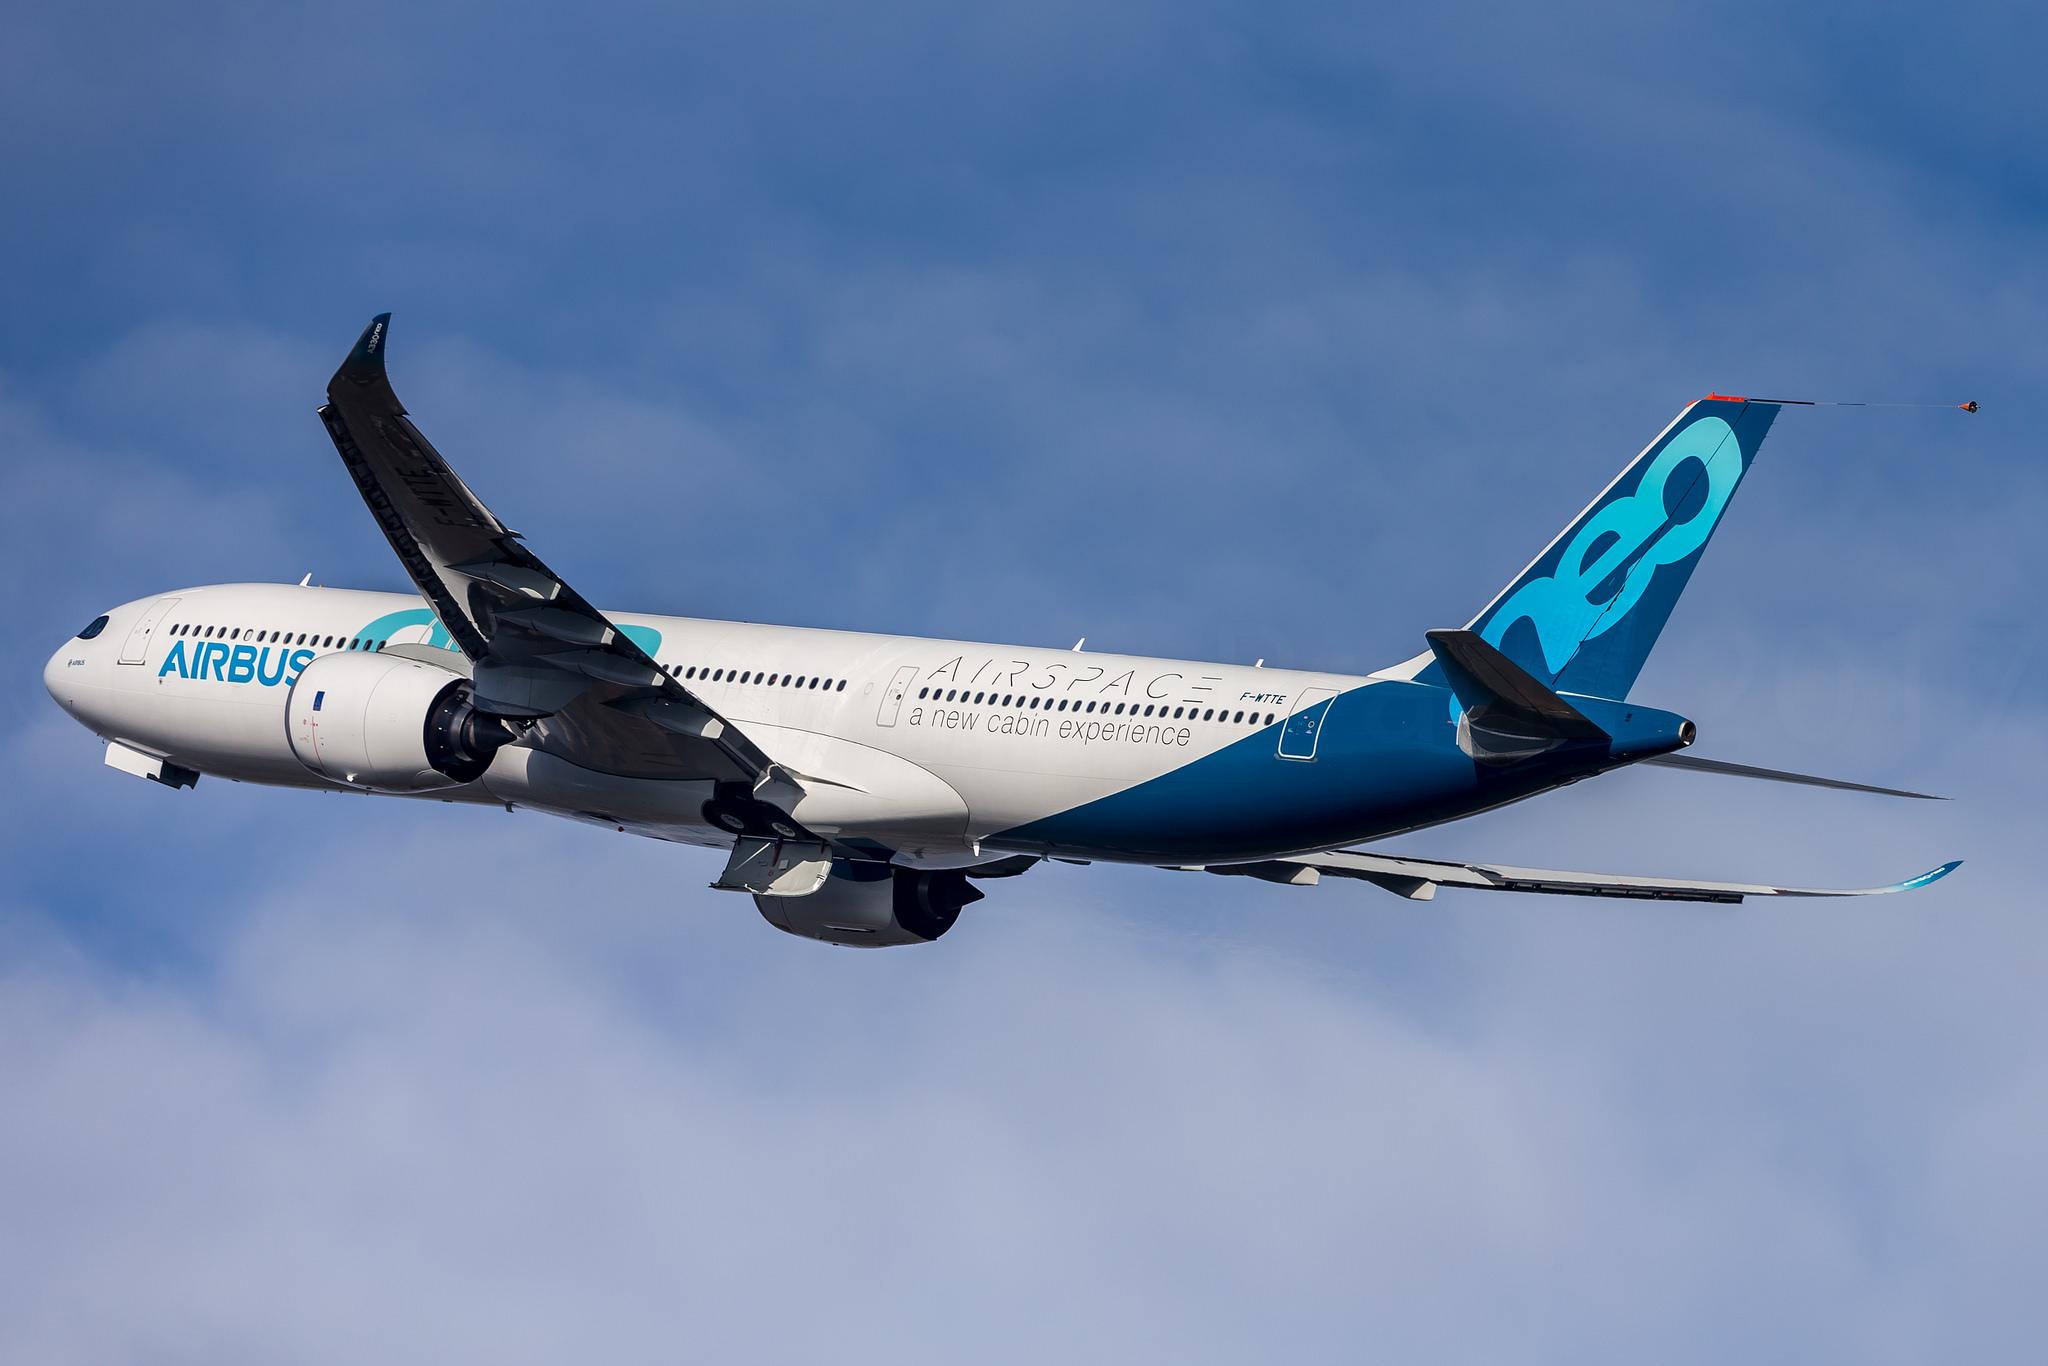 A330neoHD